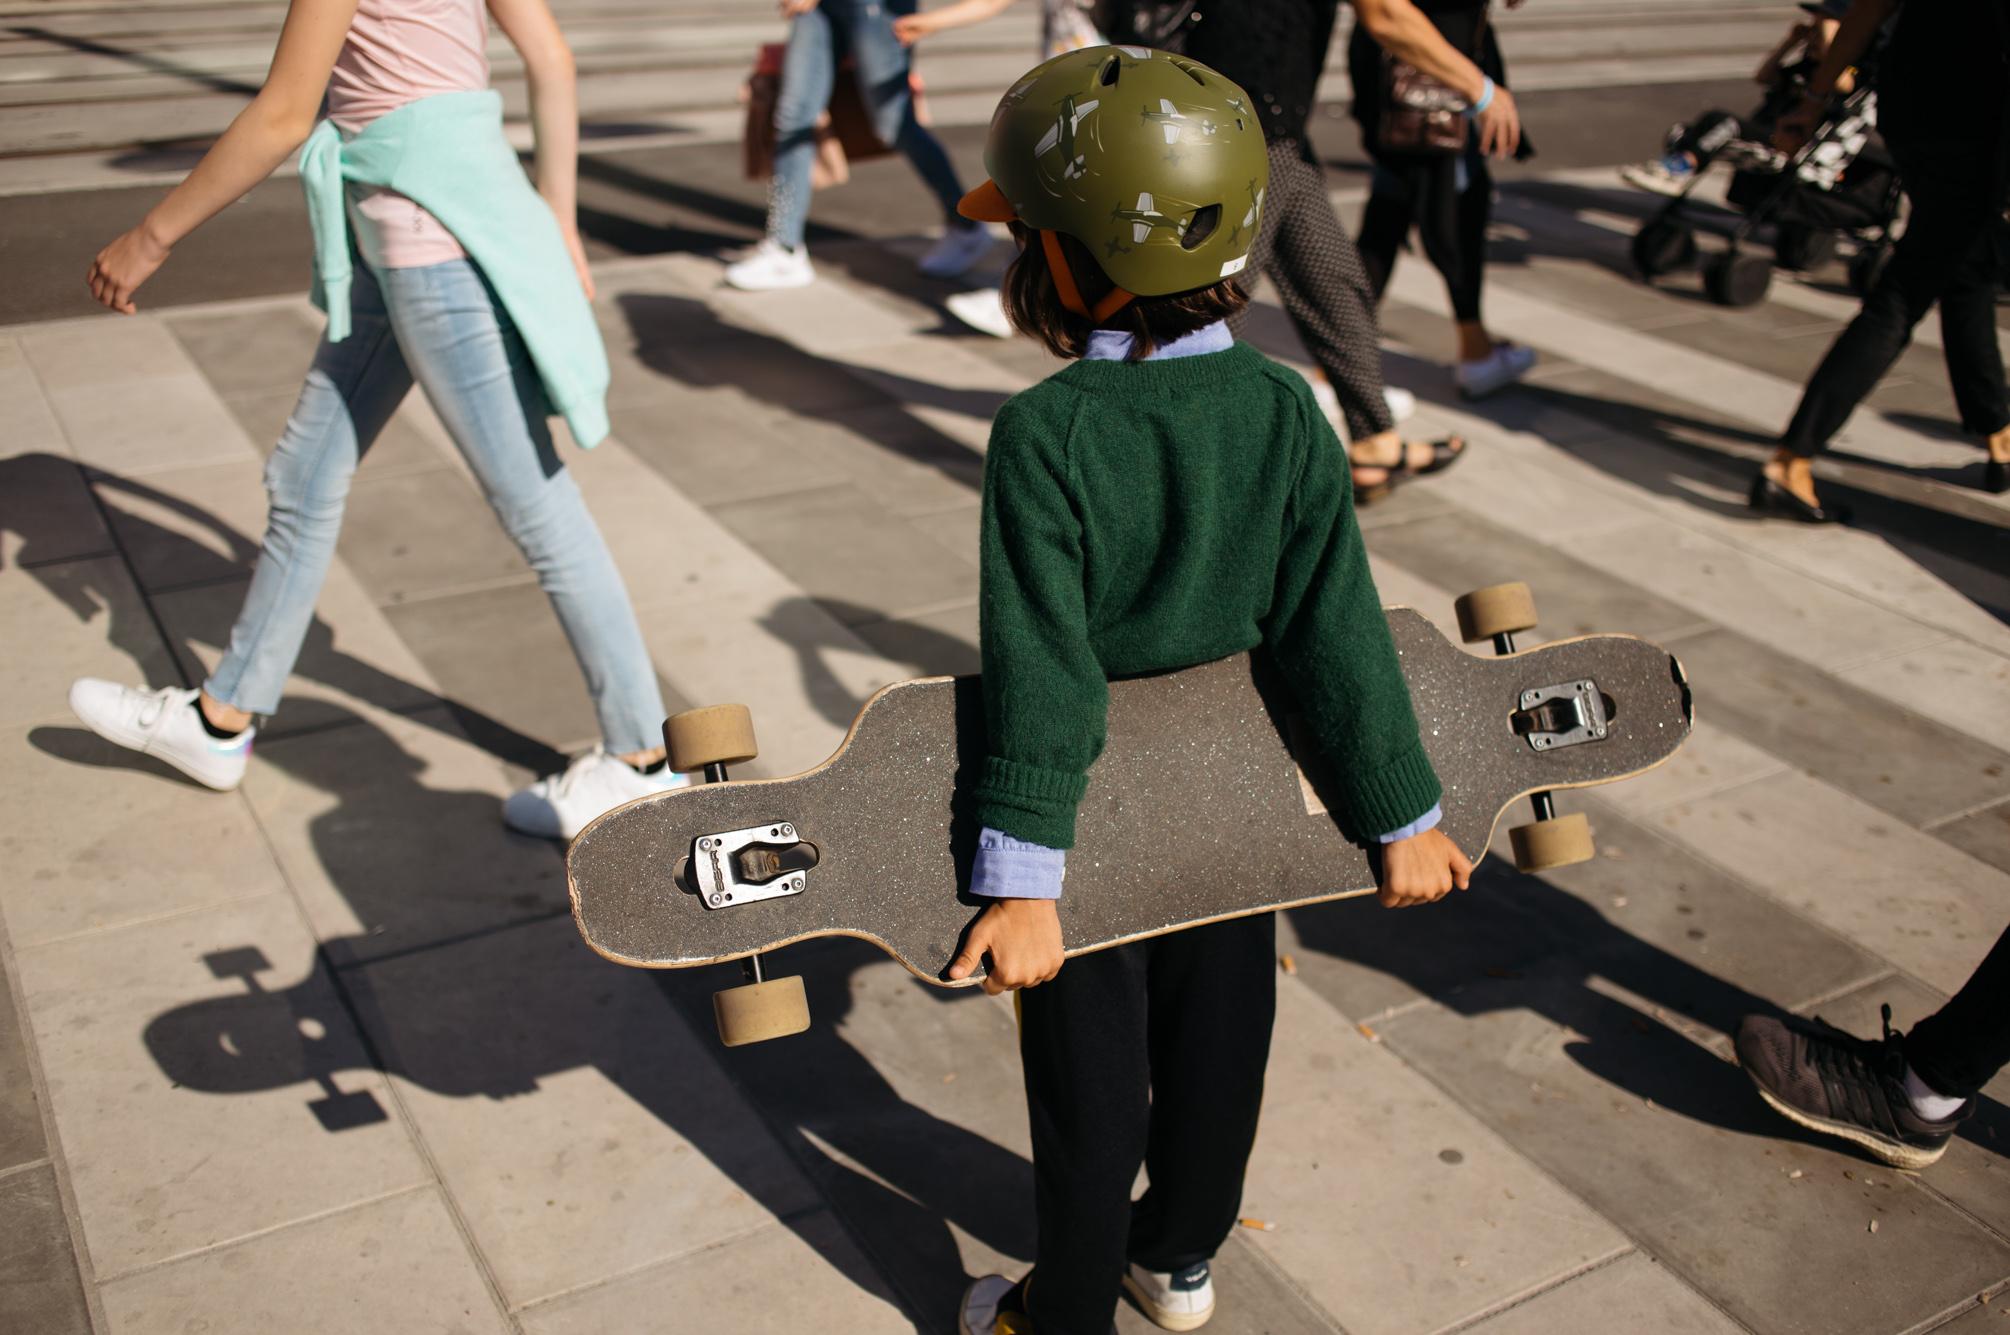 stockholm-kids-cityguide-conbotasdeagua-25.jpg